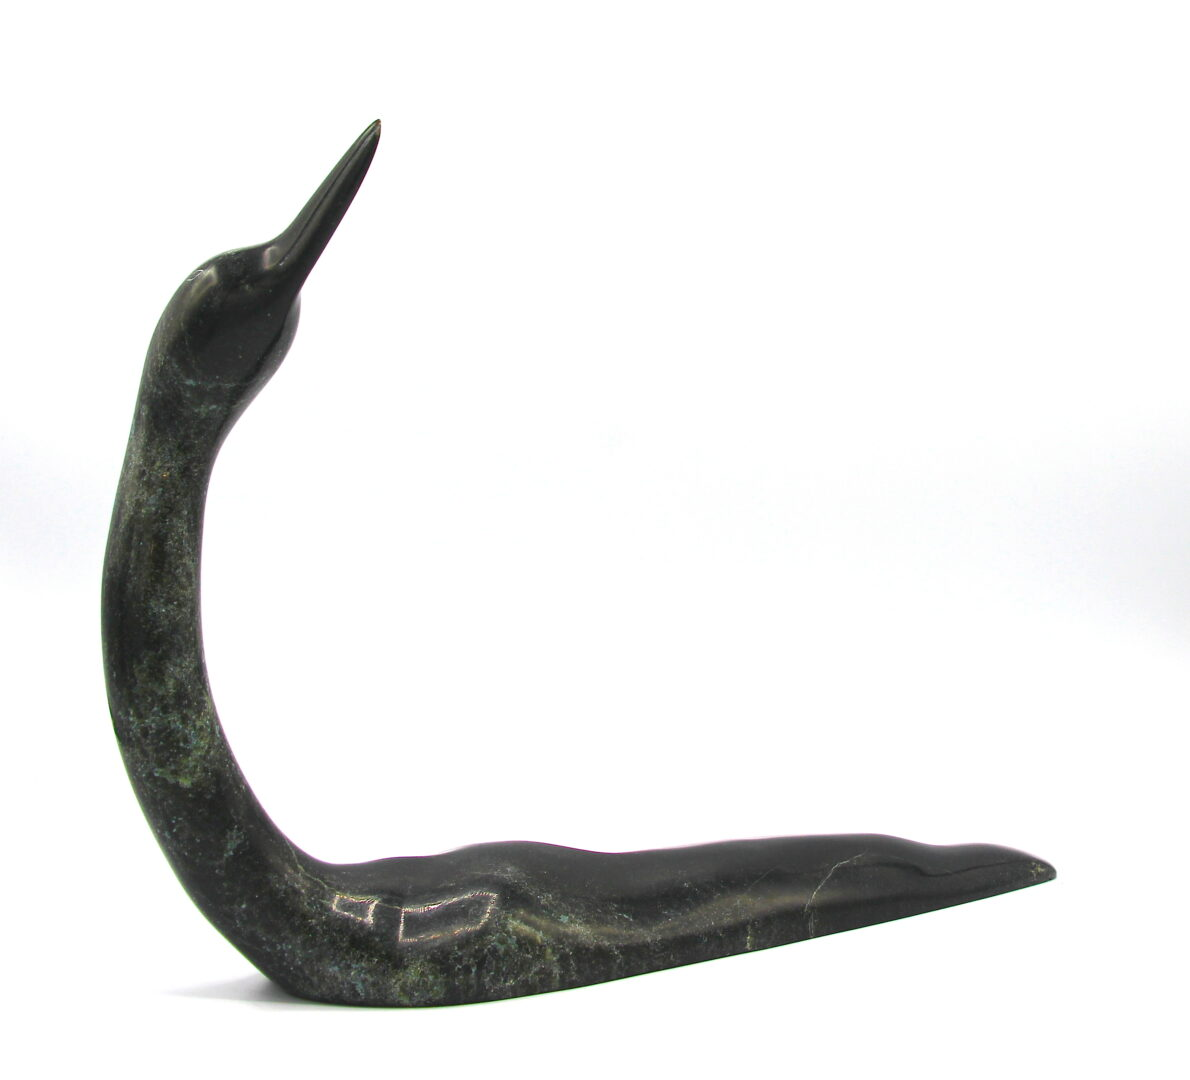 Loon K1225 Inuit art sculptures made of serpentine stone cape dorset